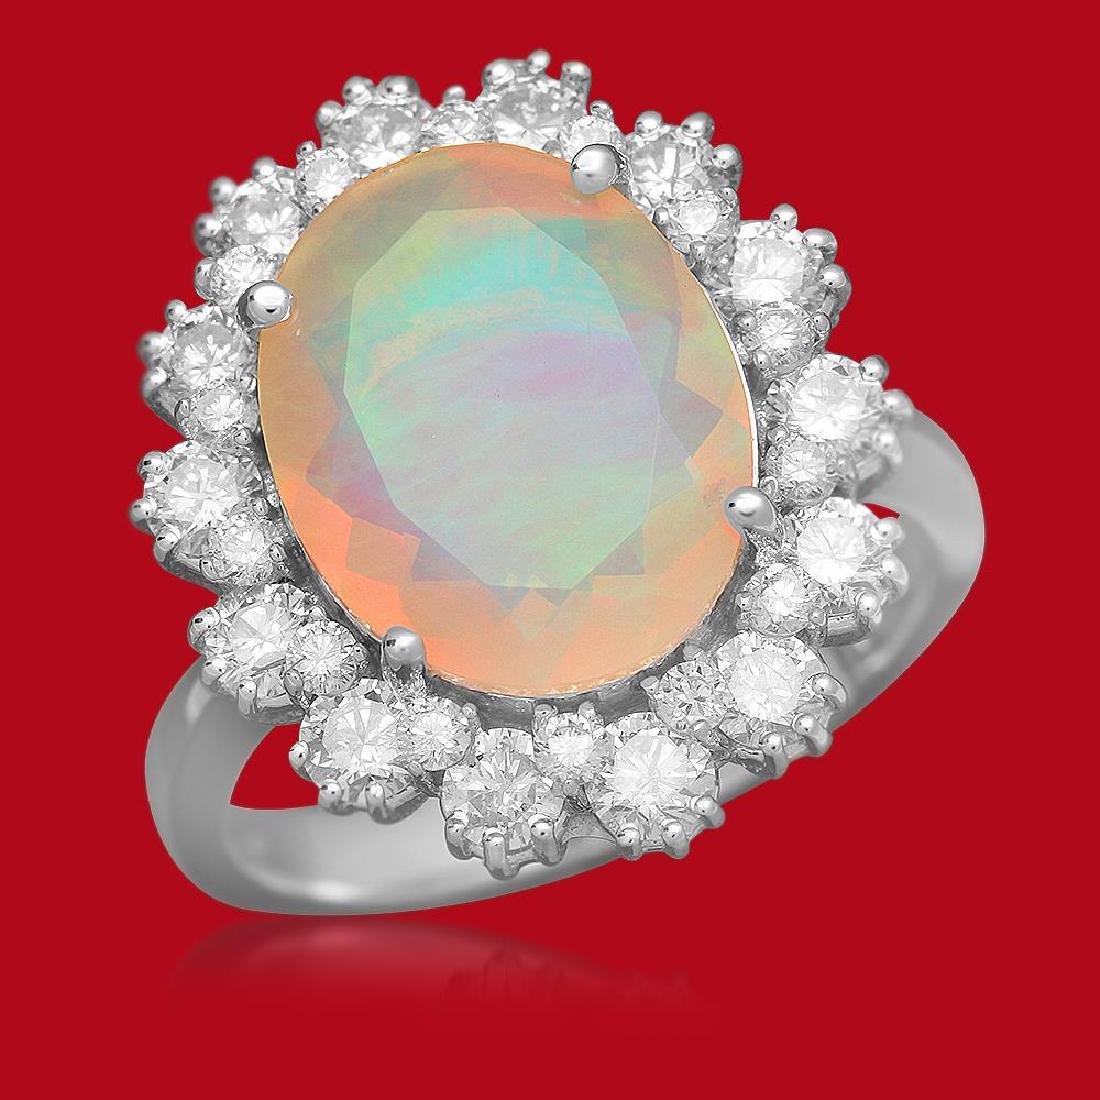 14K Gold 2.61ct Opal 1.32ct Diamond Ring